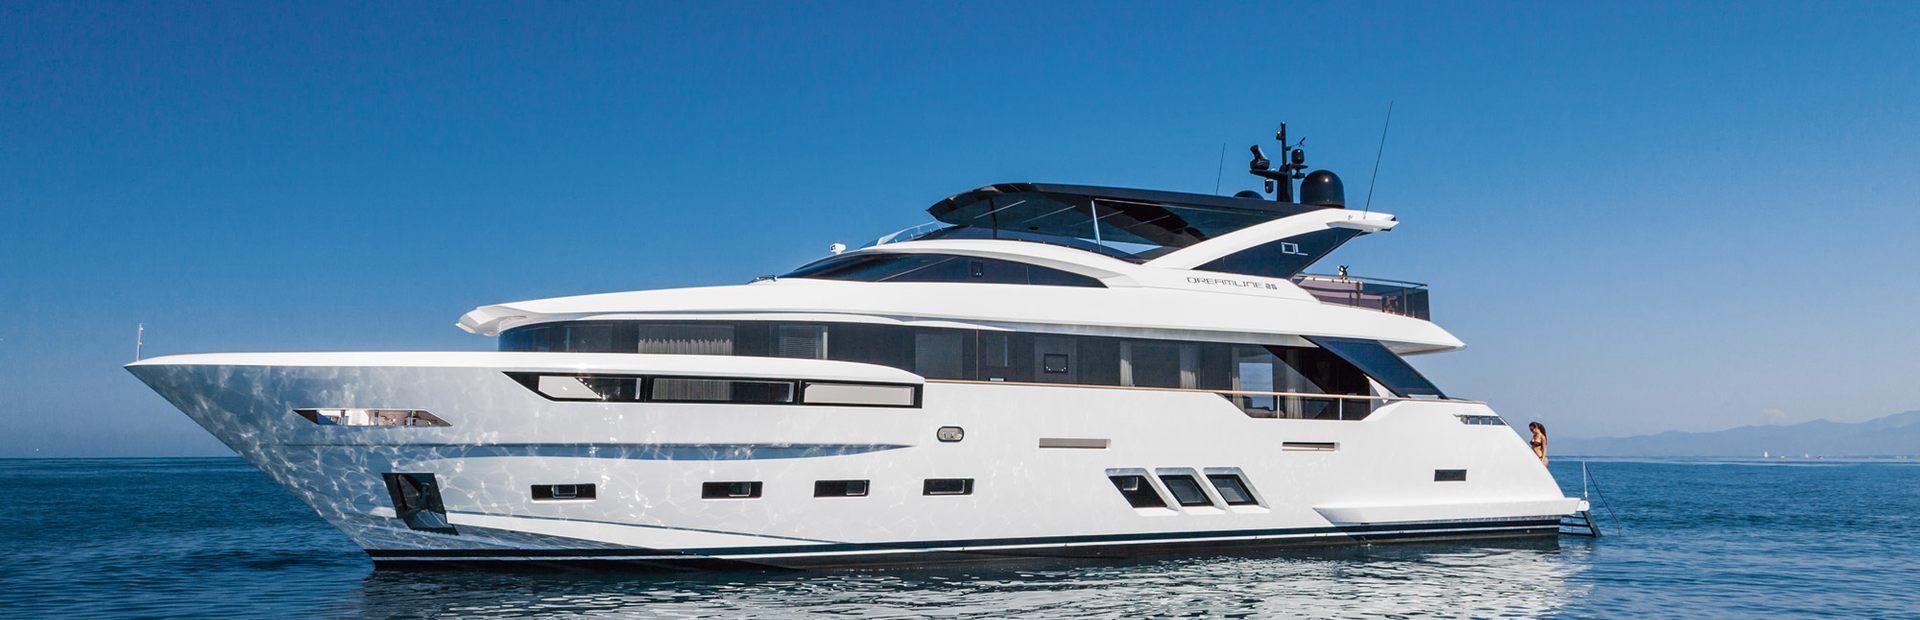 Dreamline 26 Yacht Charter